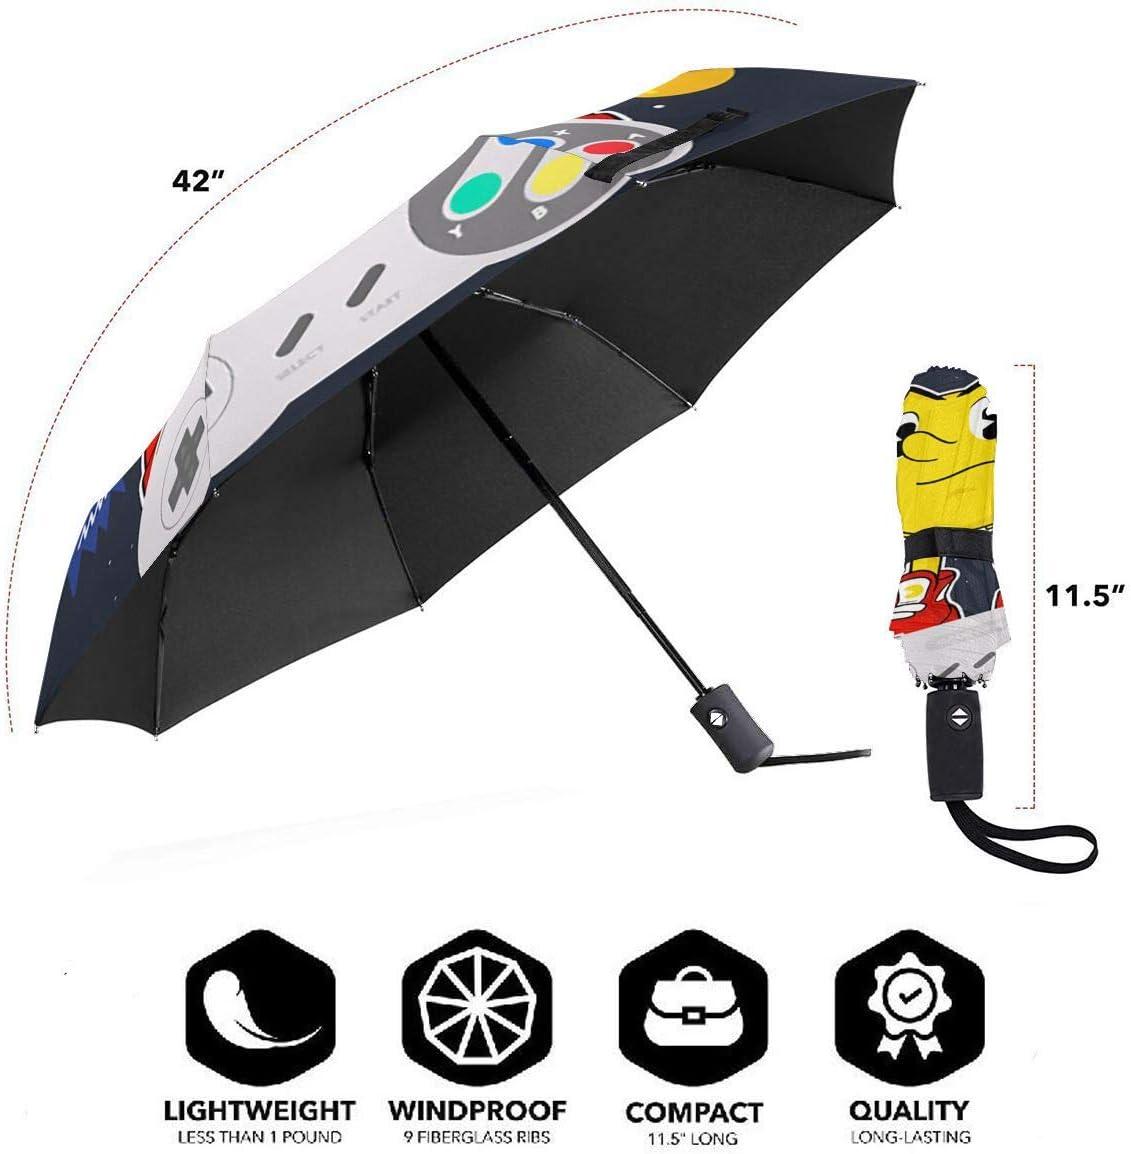 Xintaishirunjinluyoufazhany Miles Morales UV Protection Trifold Umbrella Sun Anti-UV Compact Travel Windproof Folding Automatic Open Auto Close for Unisex